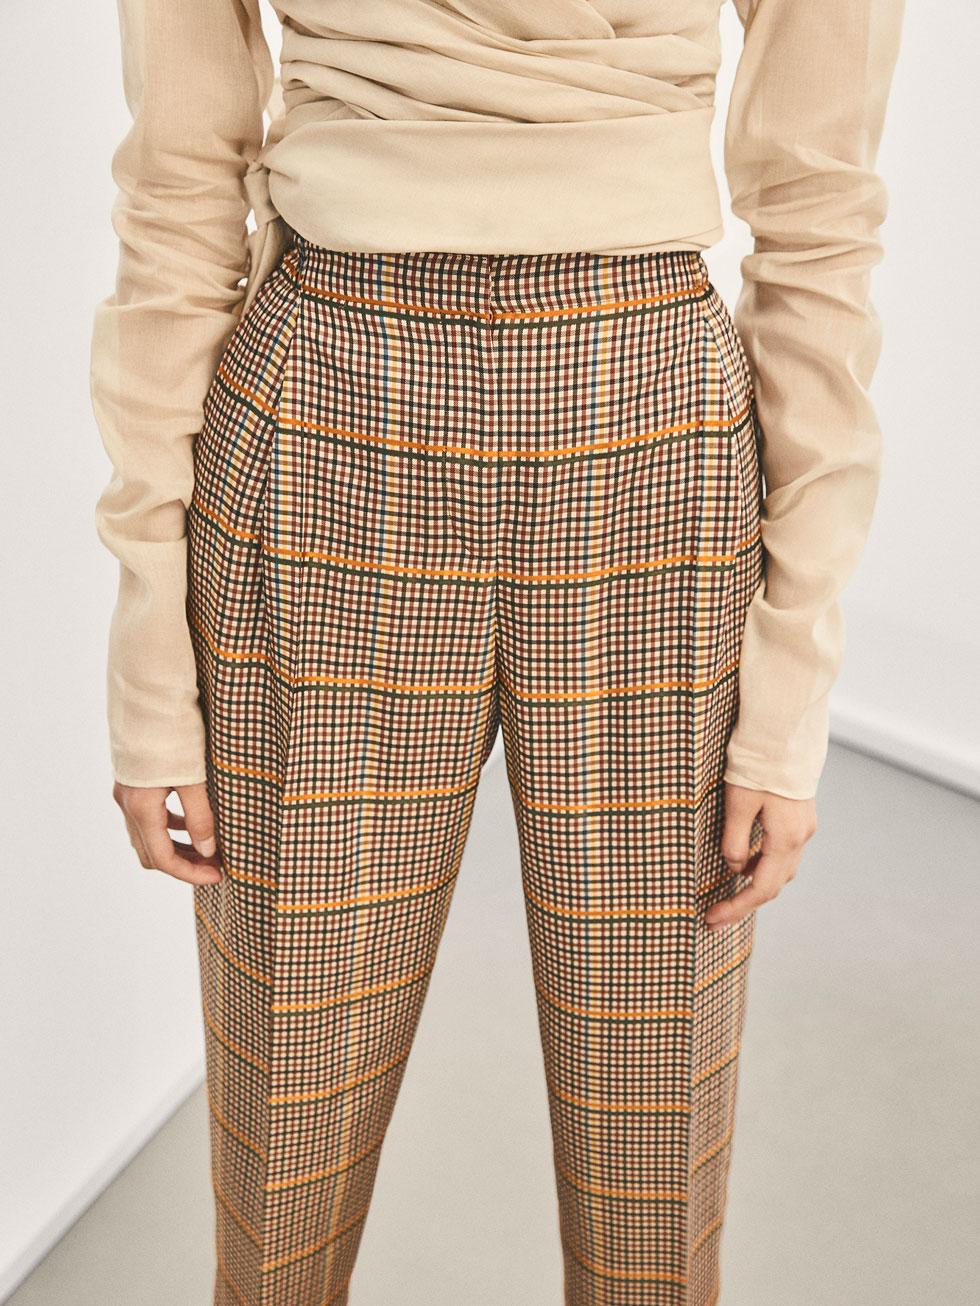 pantalon carreaux.jpg